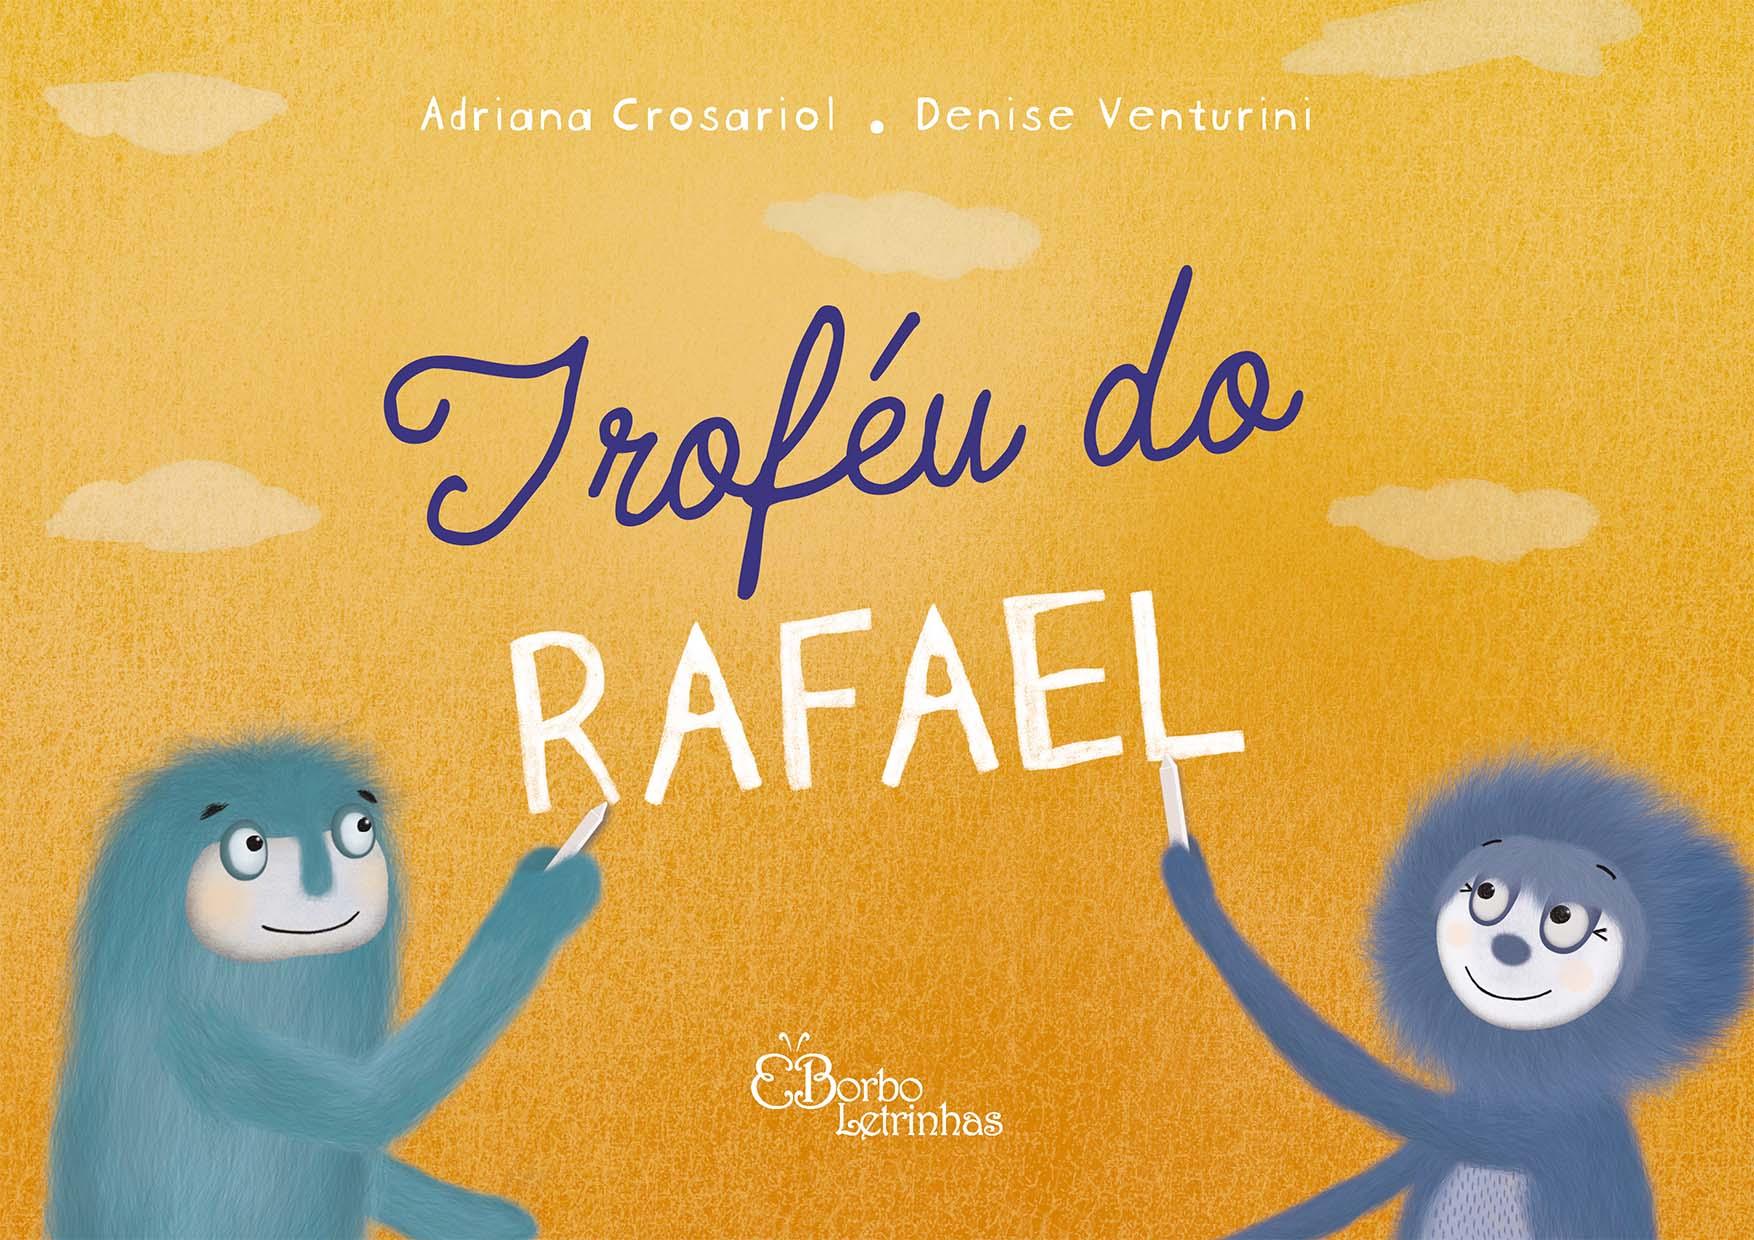 Troféu do Rafael